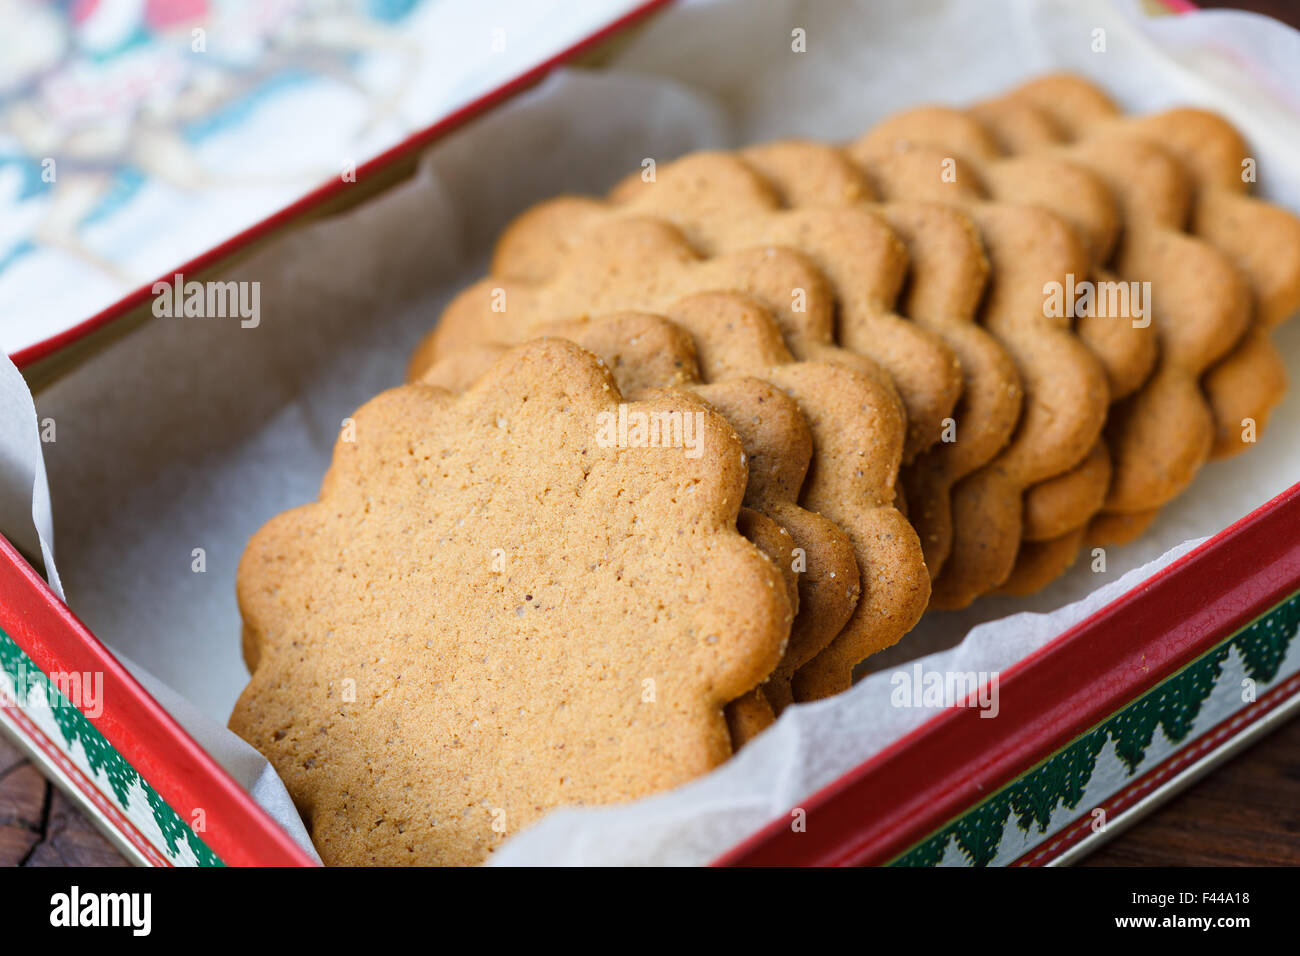 Pepparkakor suédois (Cookies) de gingembre Photo Stock